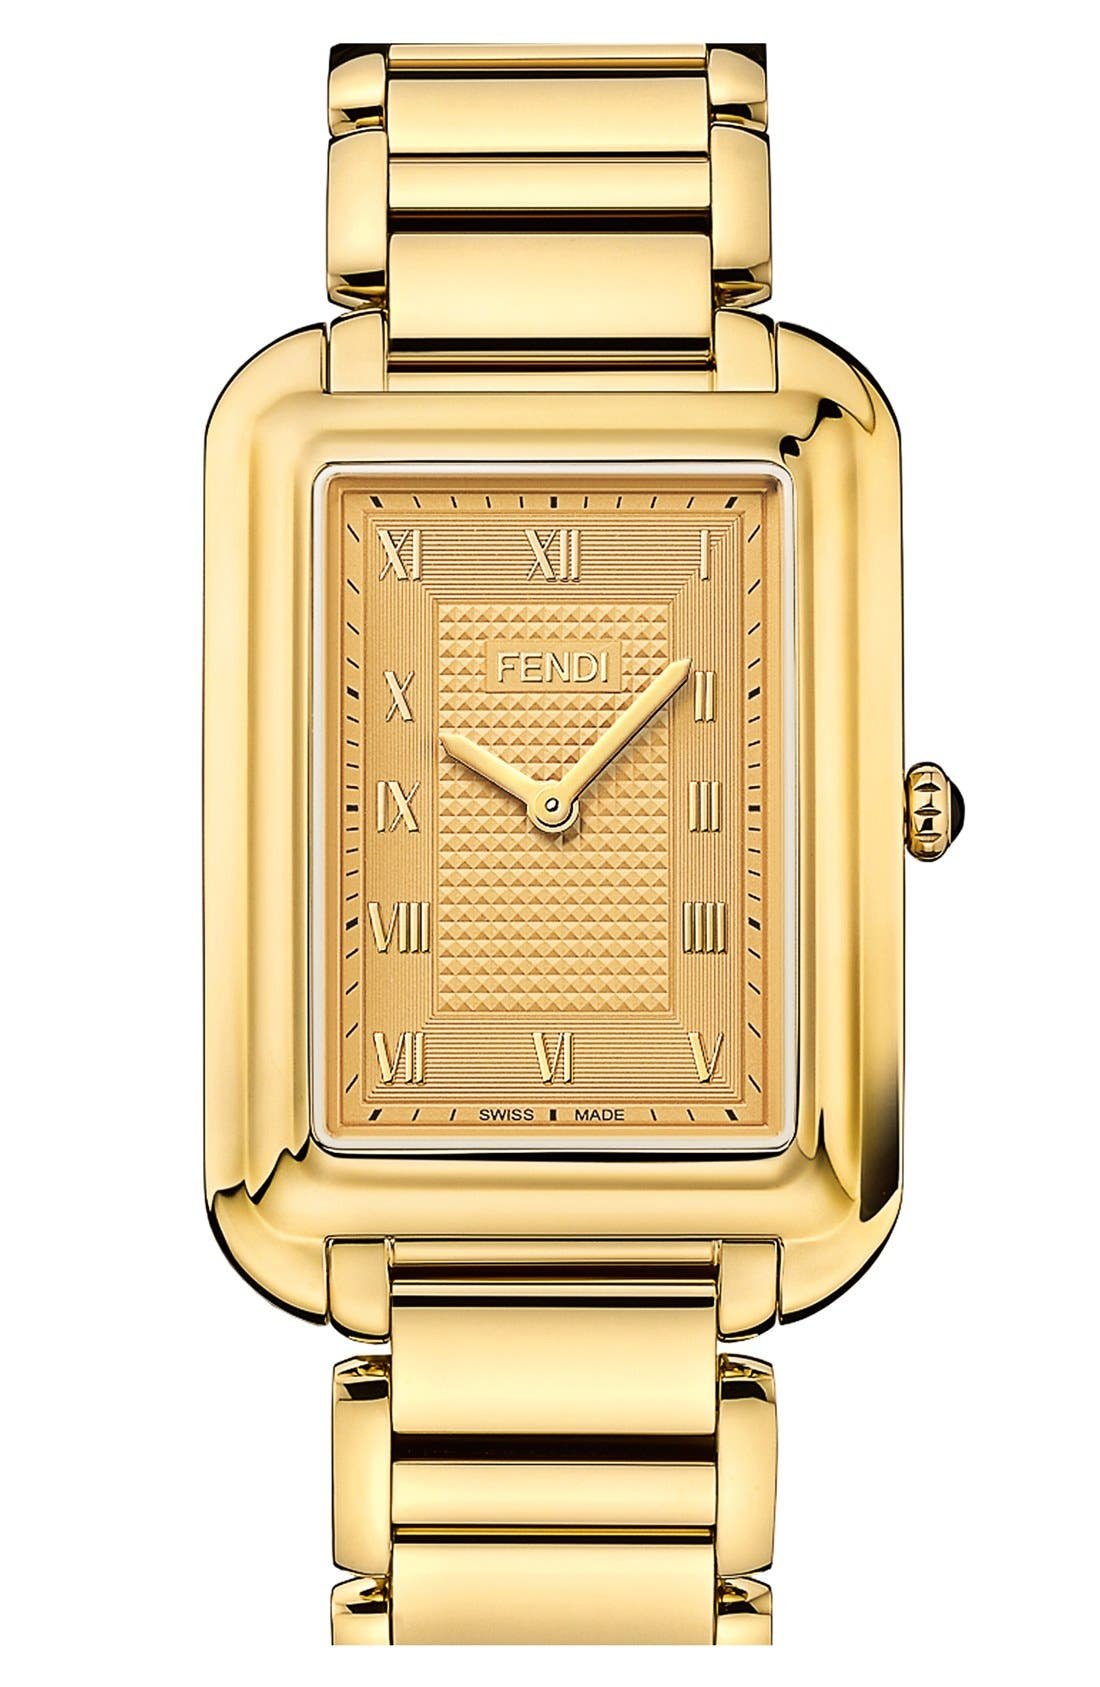 Alternate Image 1 Selected - Fendi 'Classico' Rectangular Bracelet Watch, 31mm x 38mm